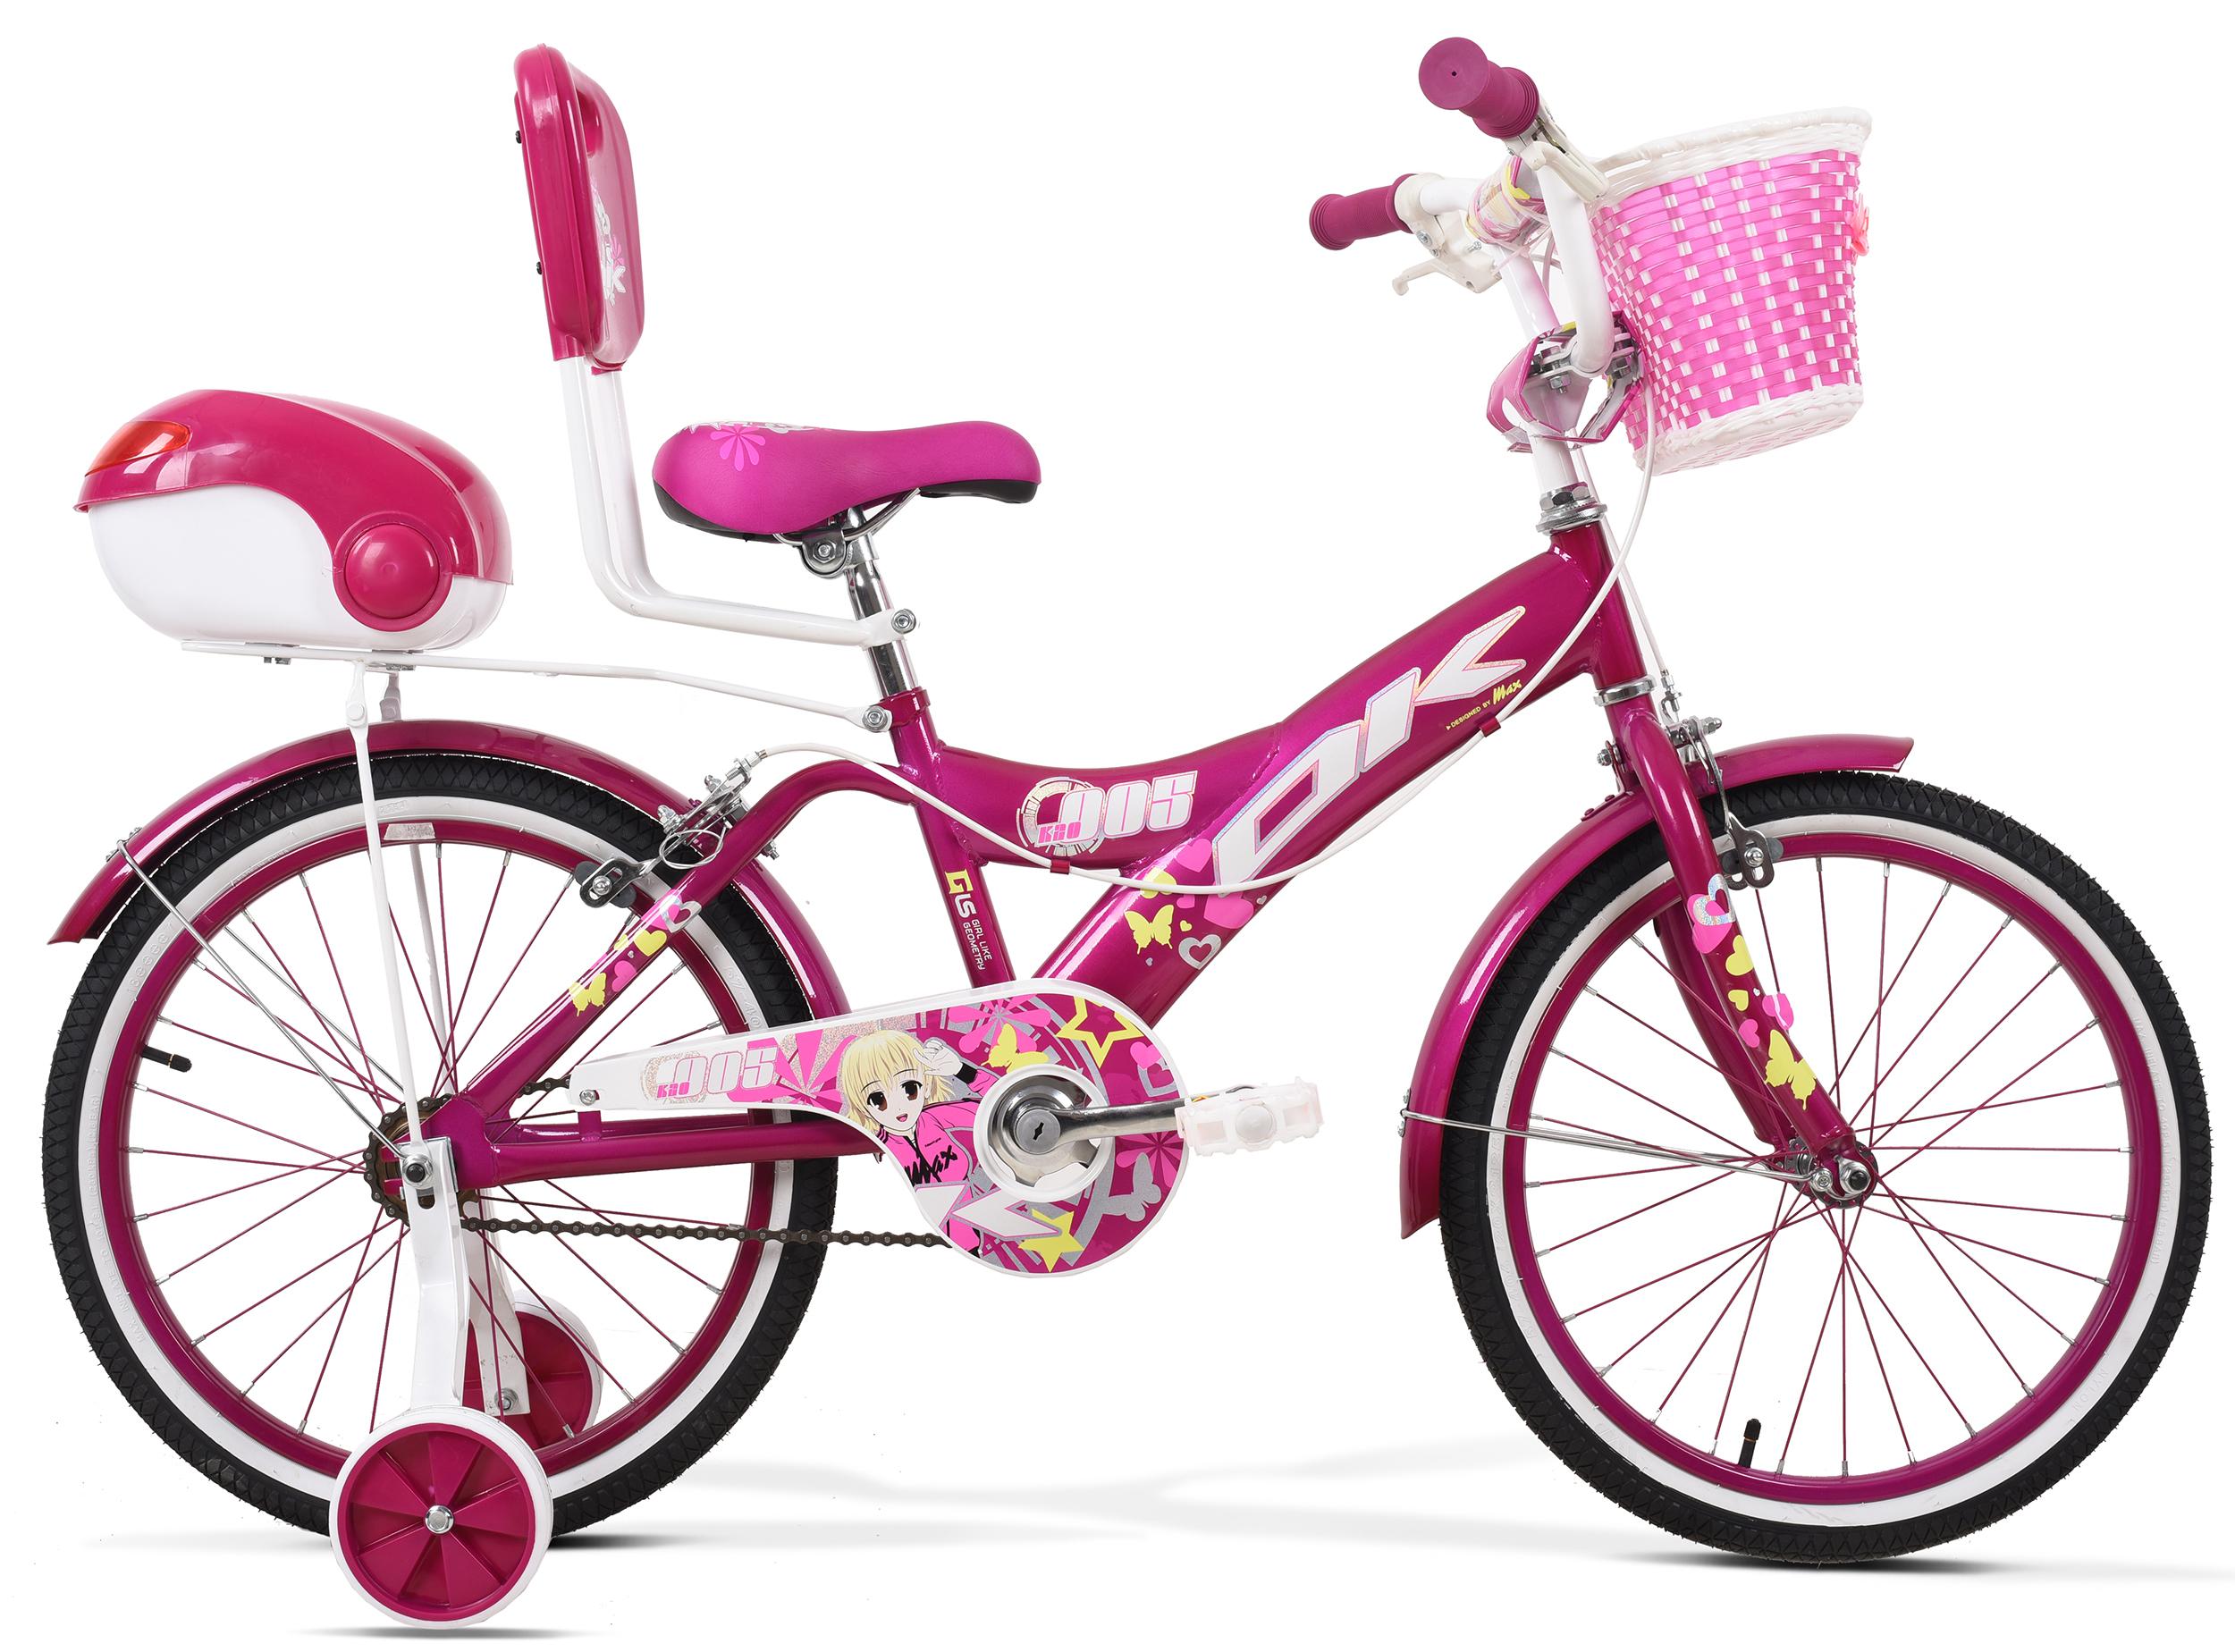 دوچرخه سایز 20 مدل K20005HR